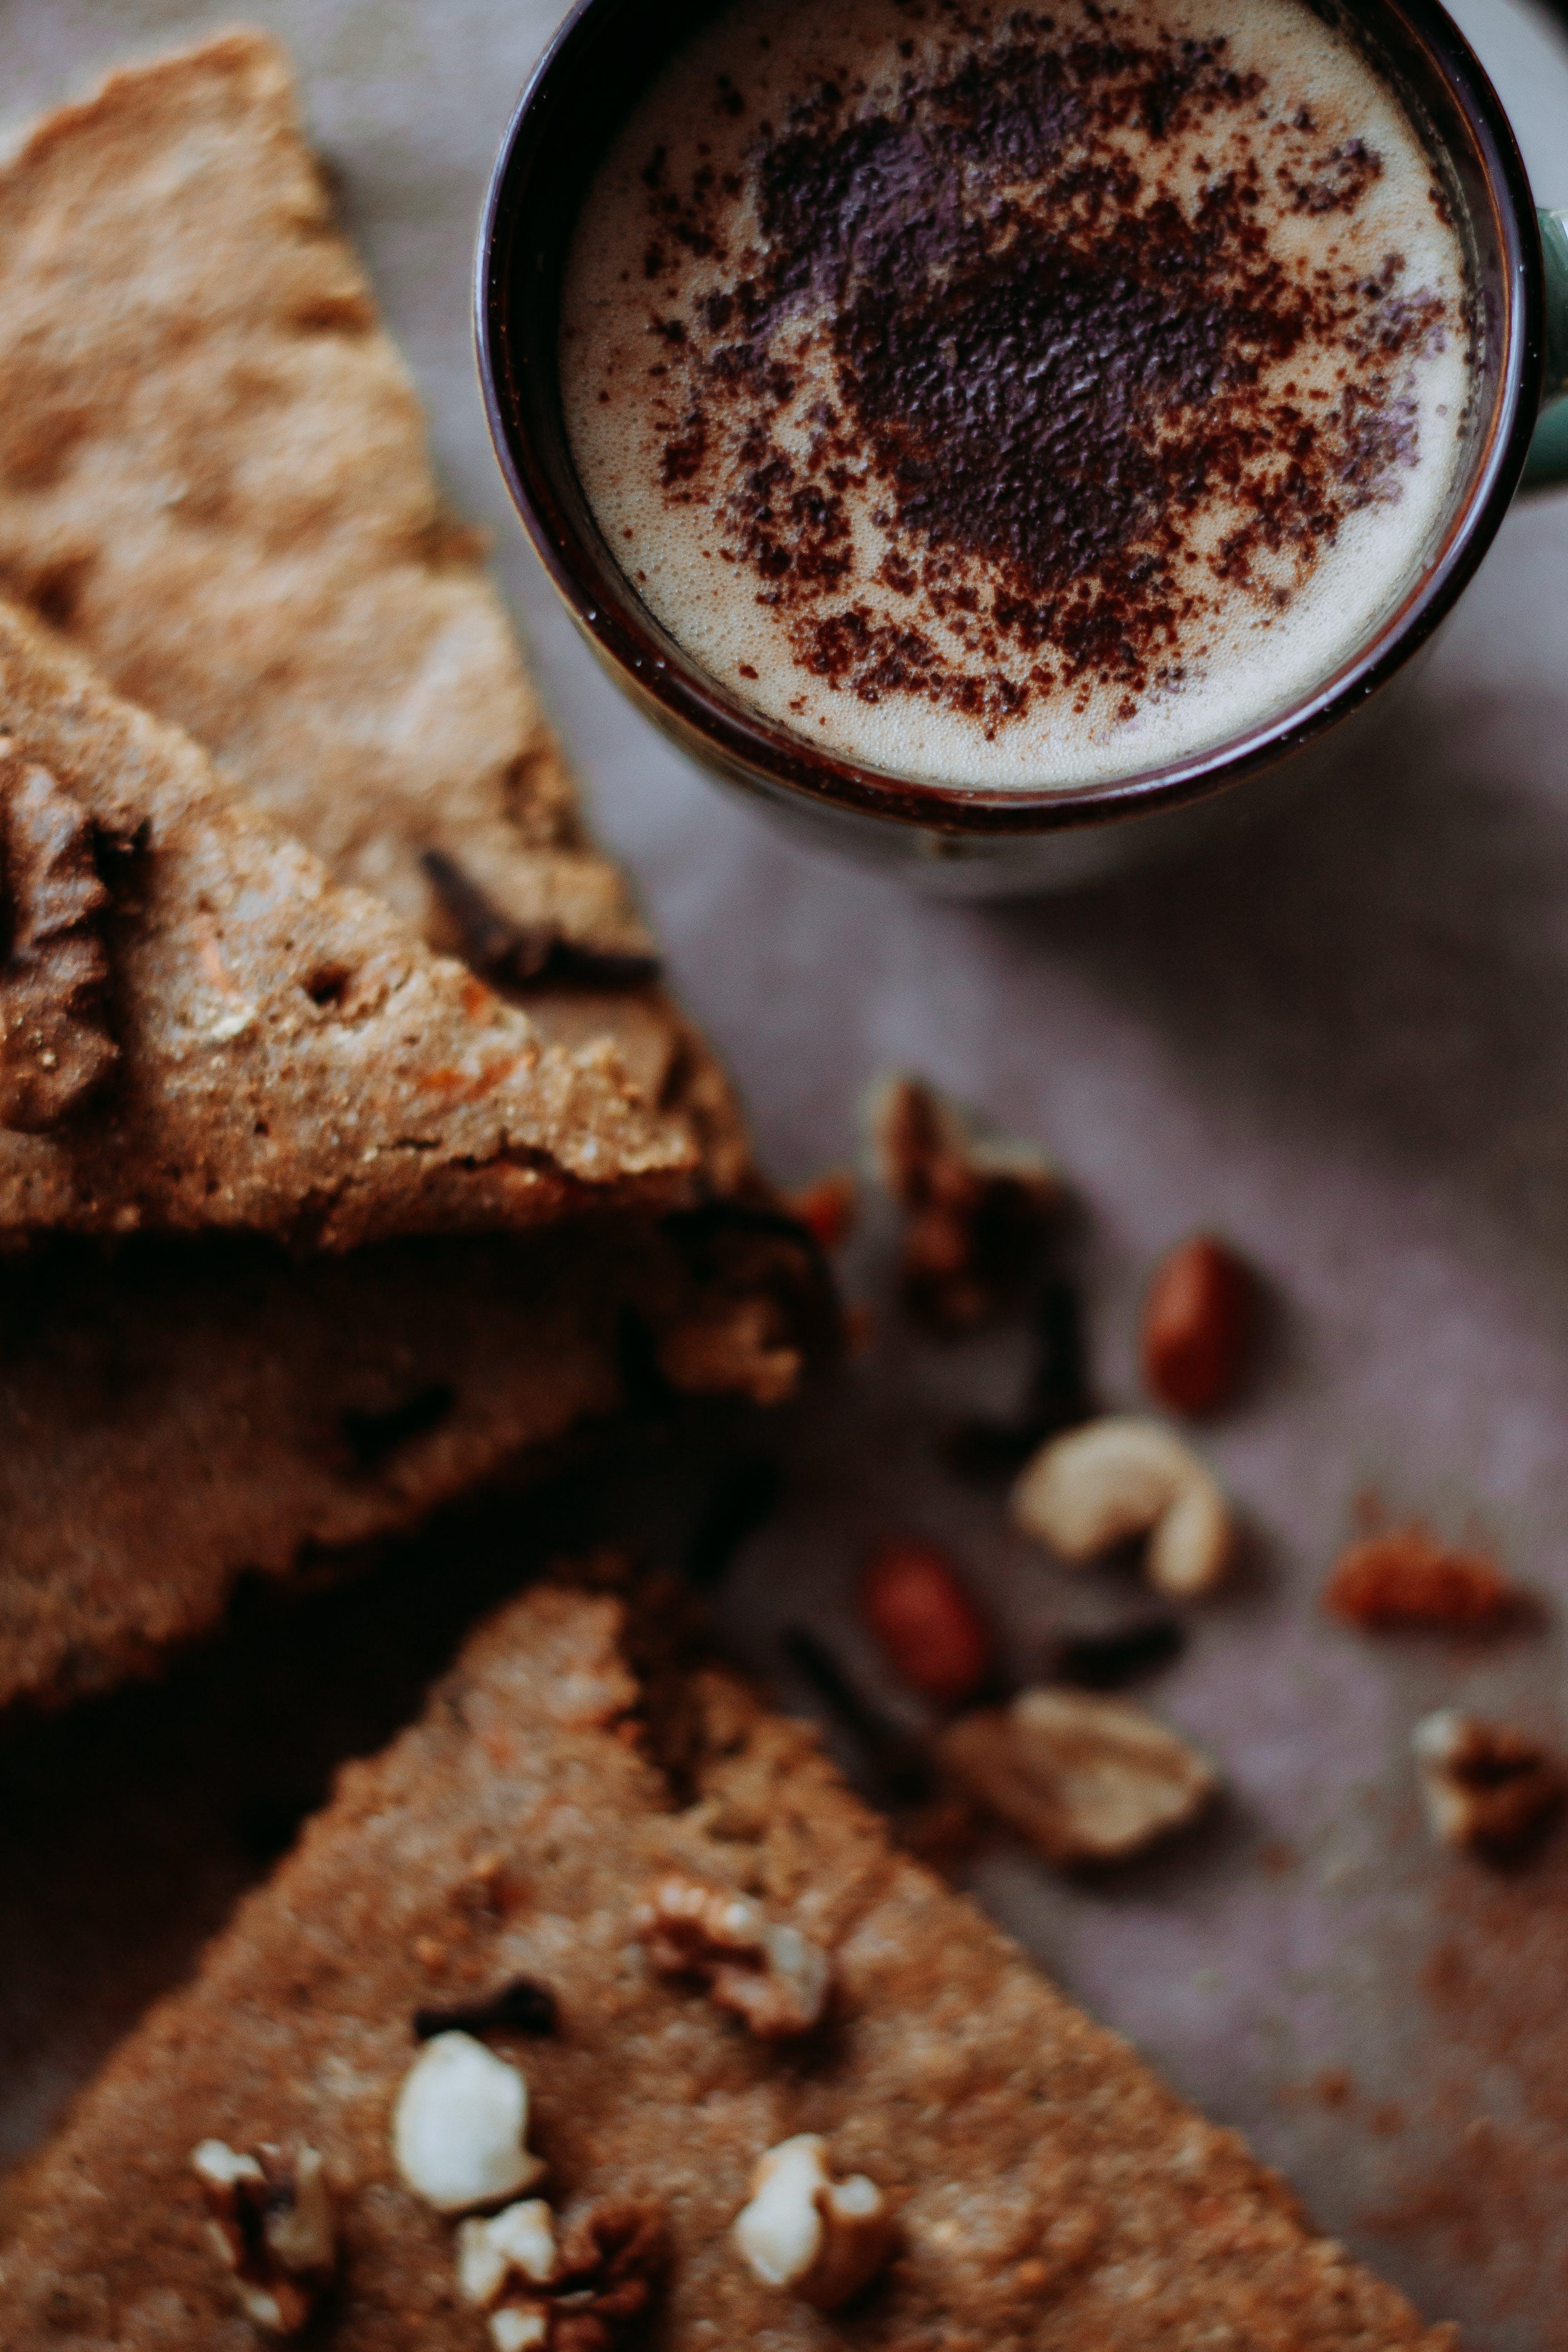 Kostenloses Stock Foto zu brot, cappuccino, dessert, frühstück